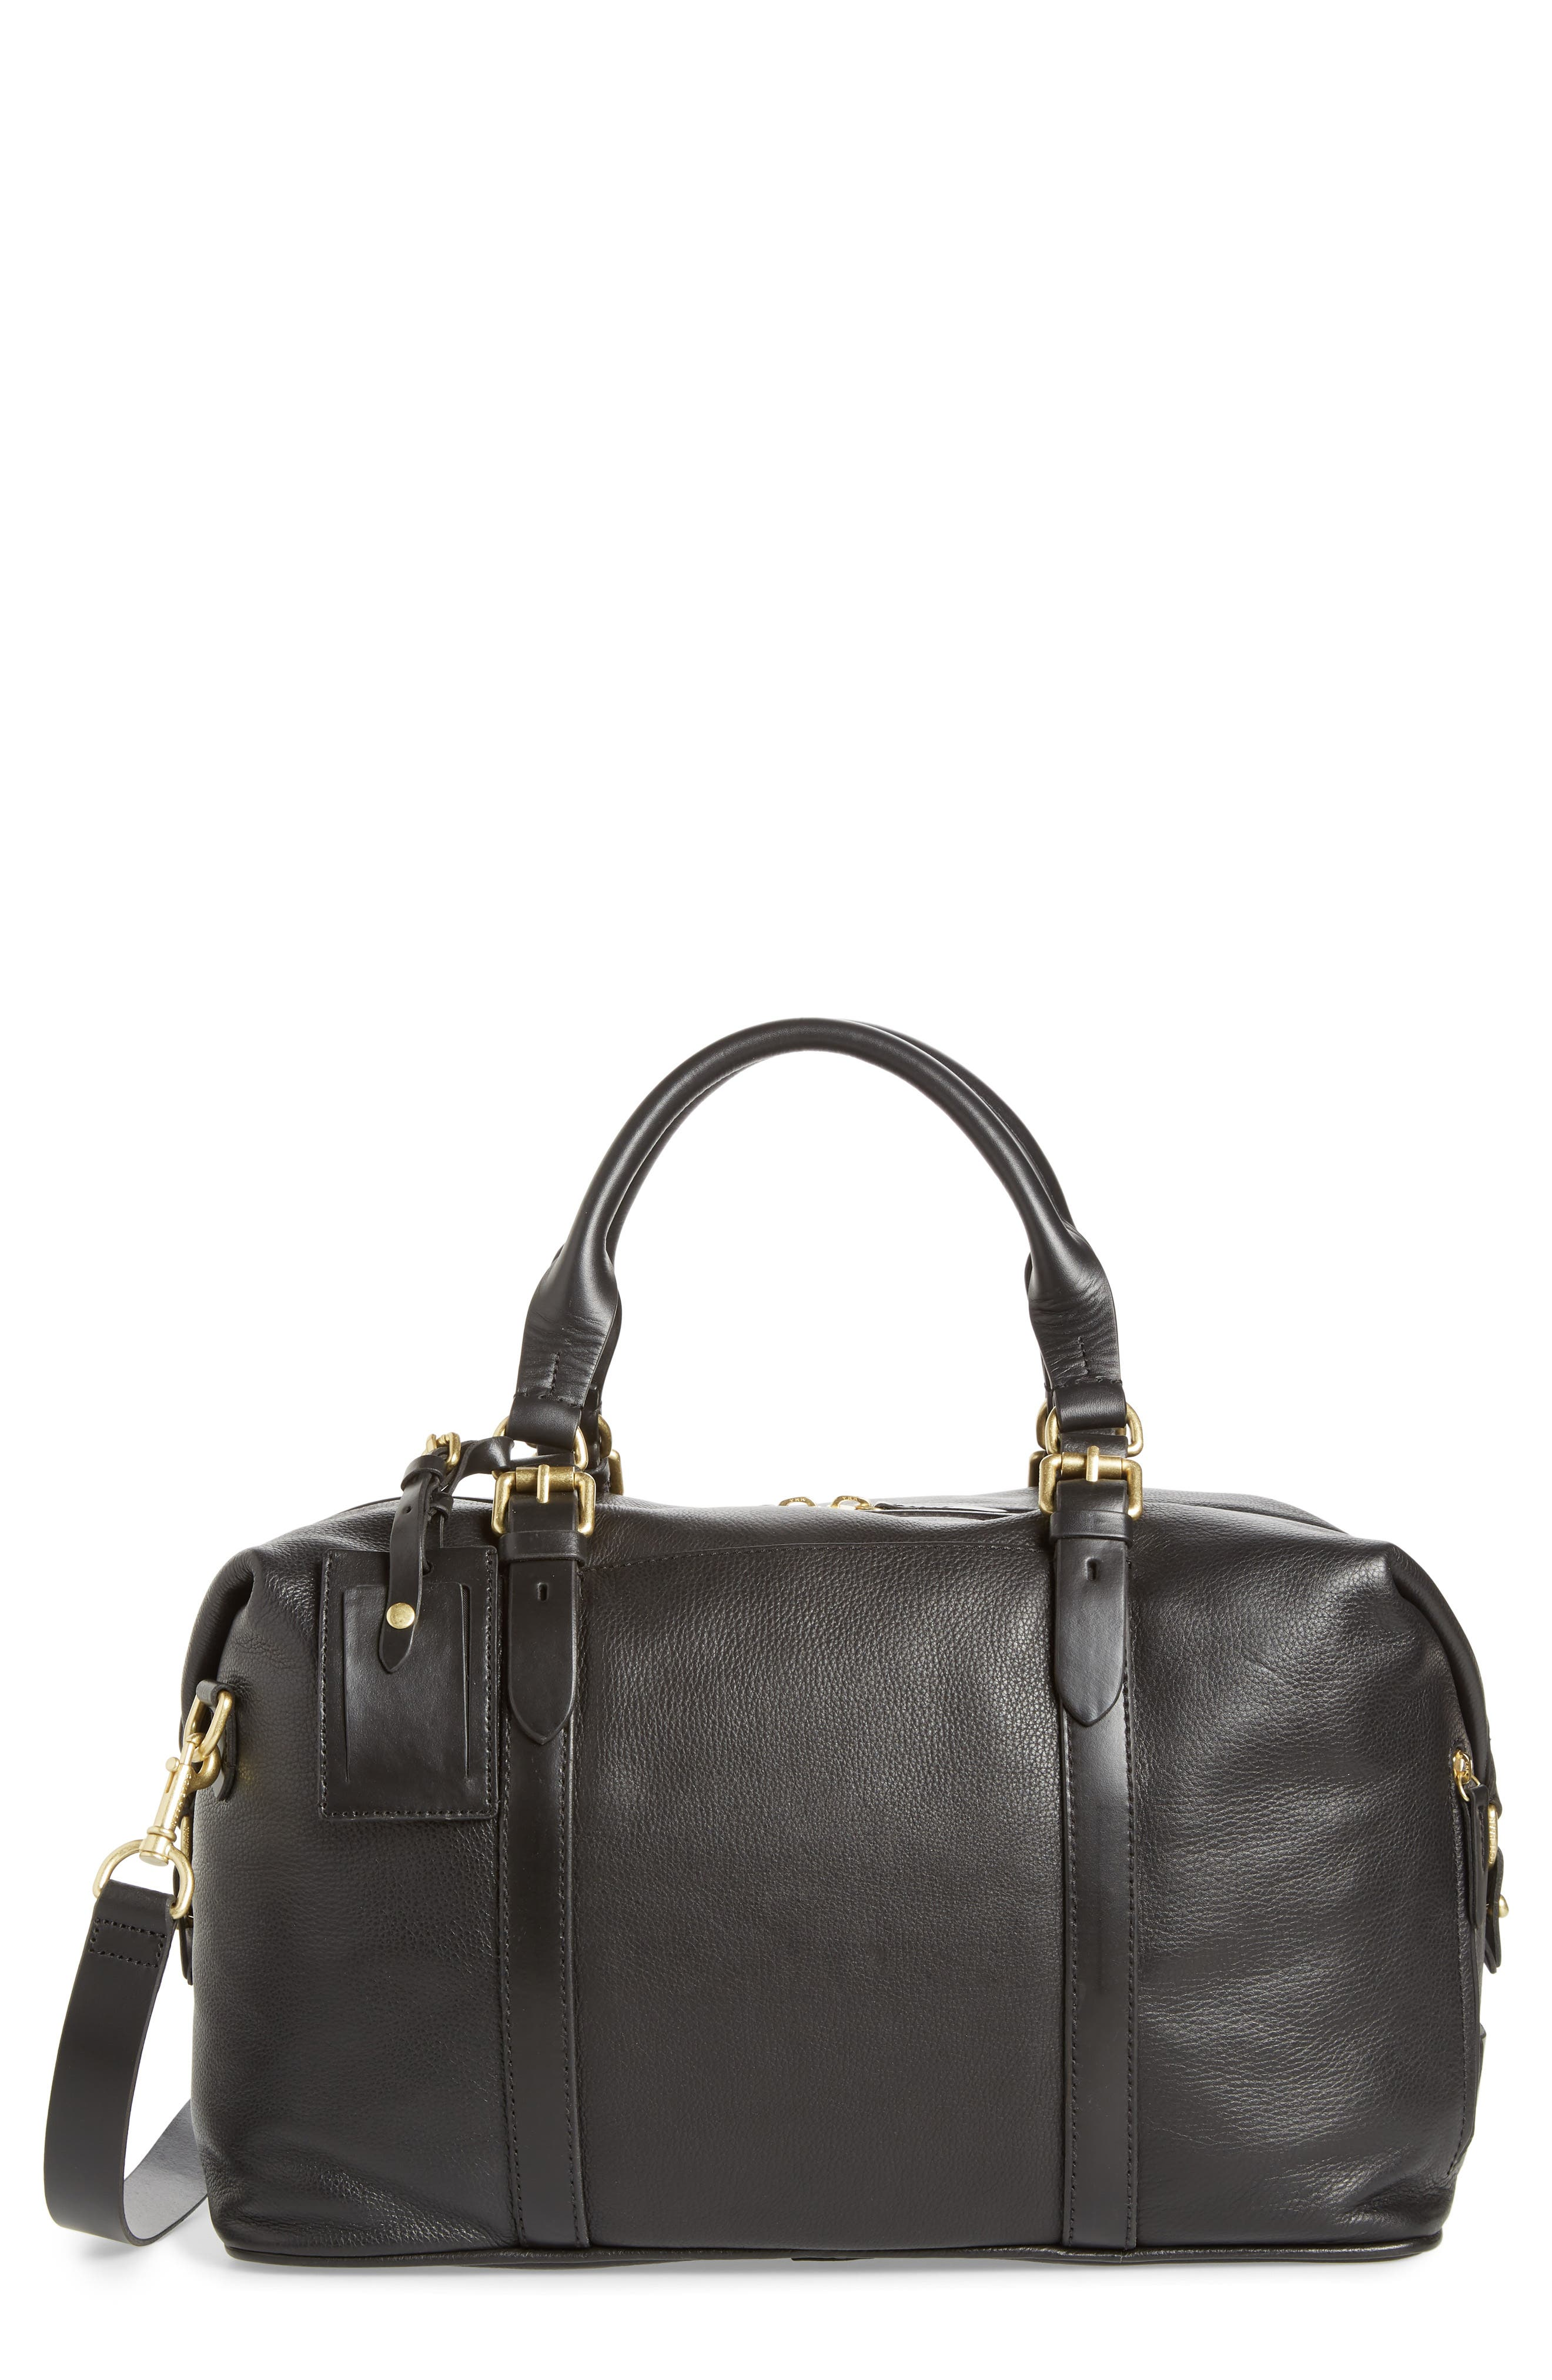 COLE HAAN Matthews Duffel Bag, Main, color, 001